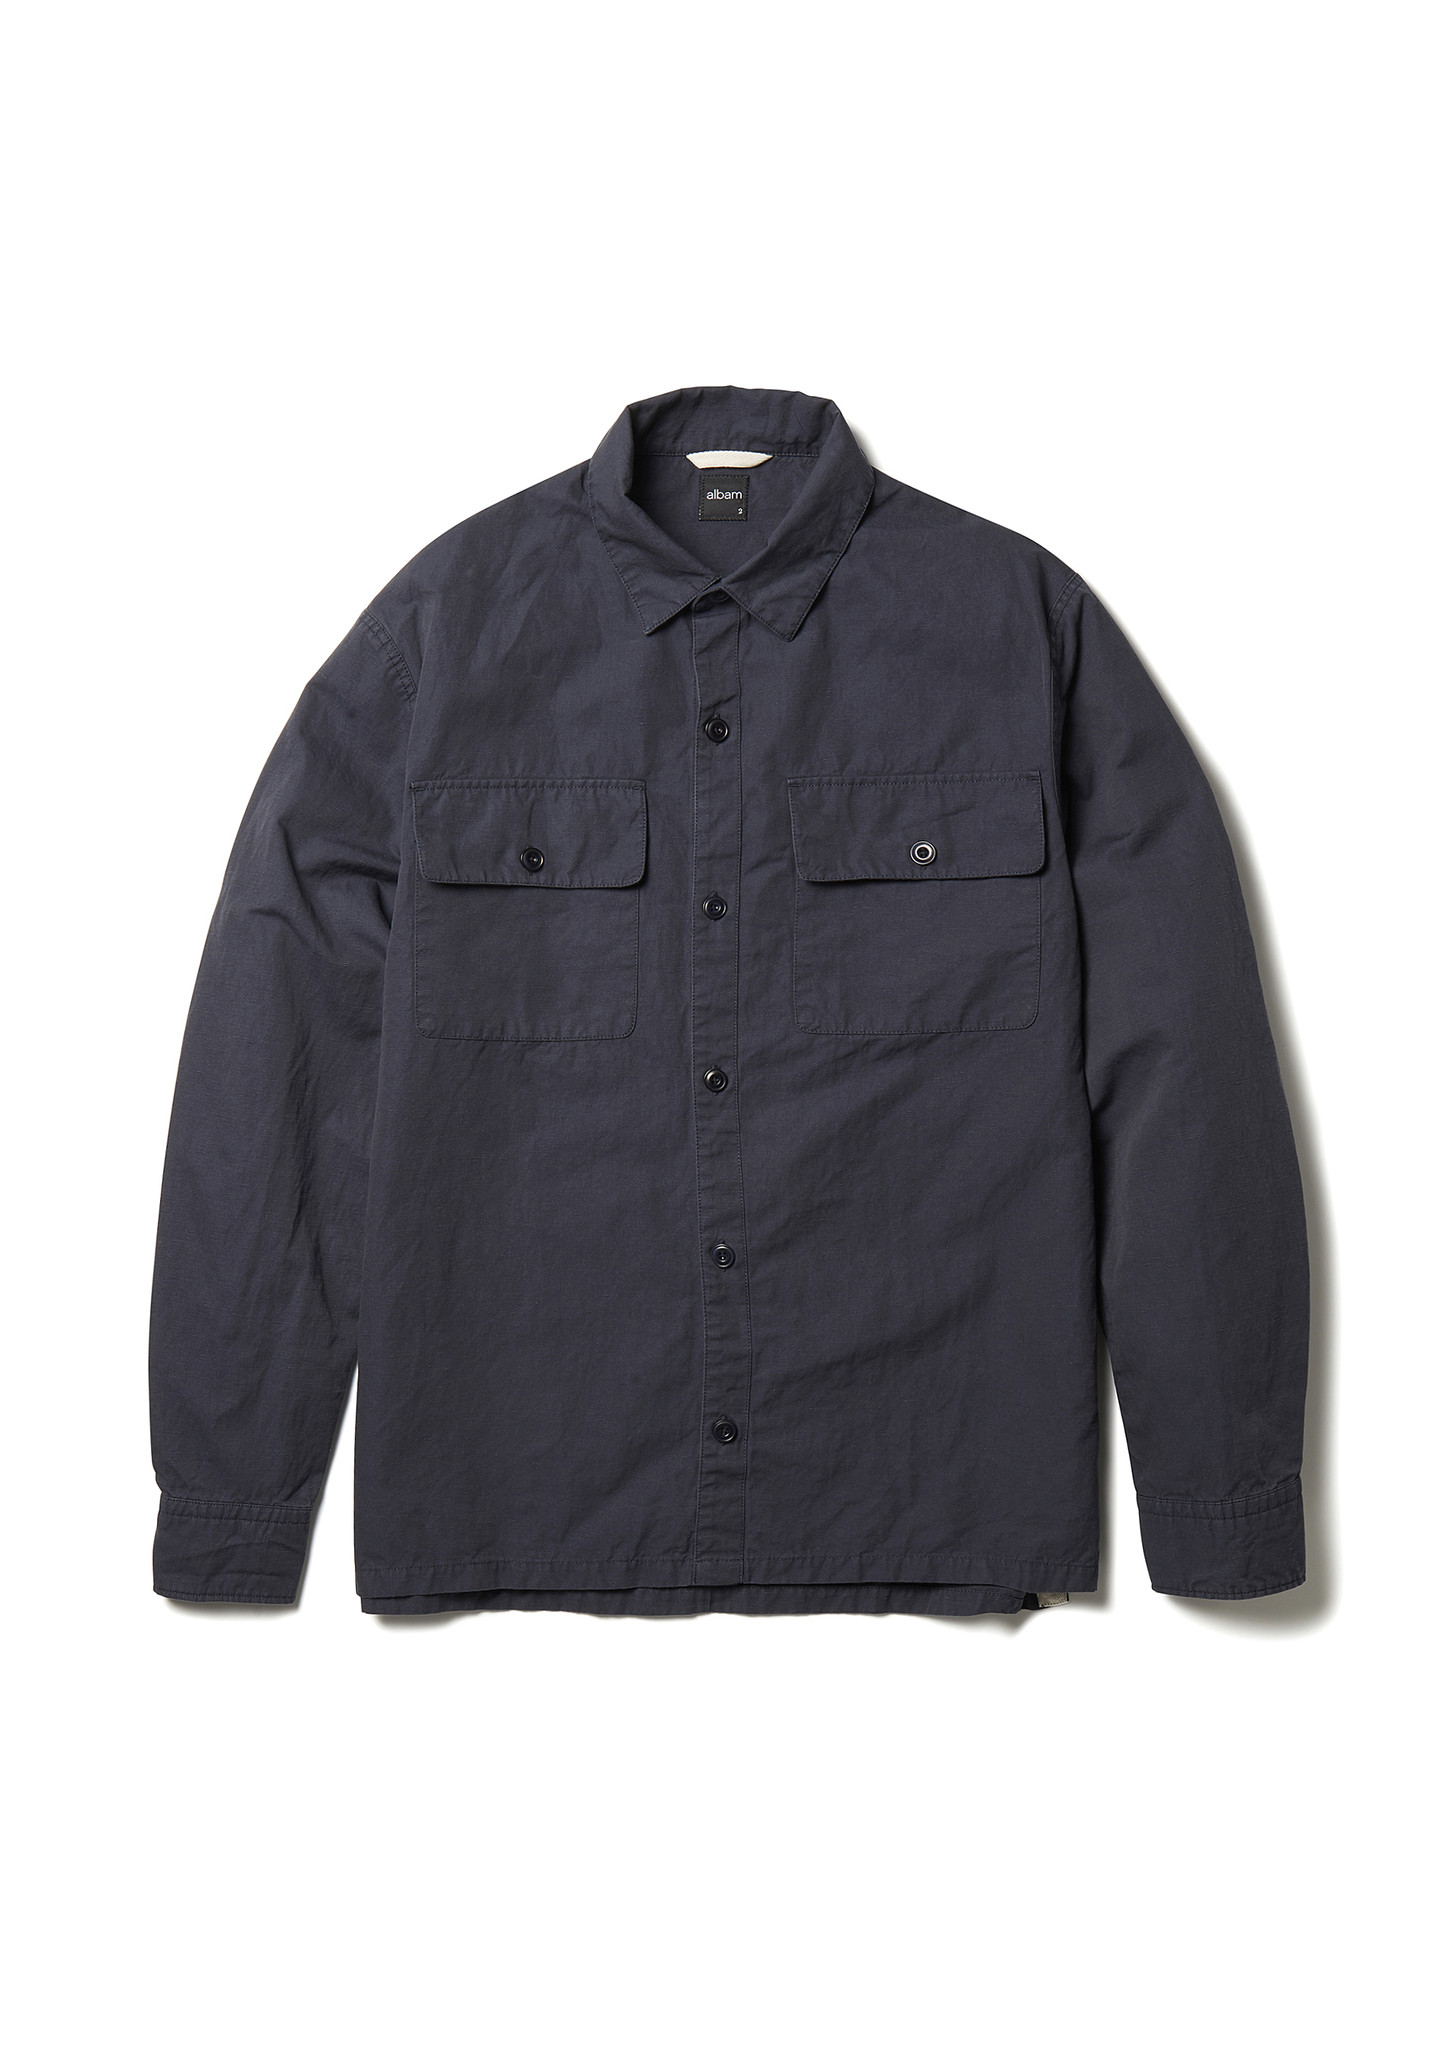 shirt4_01